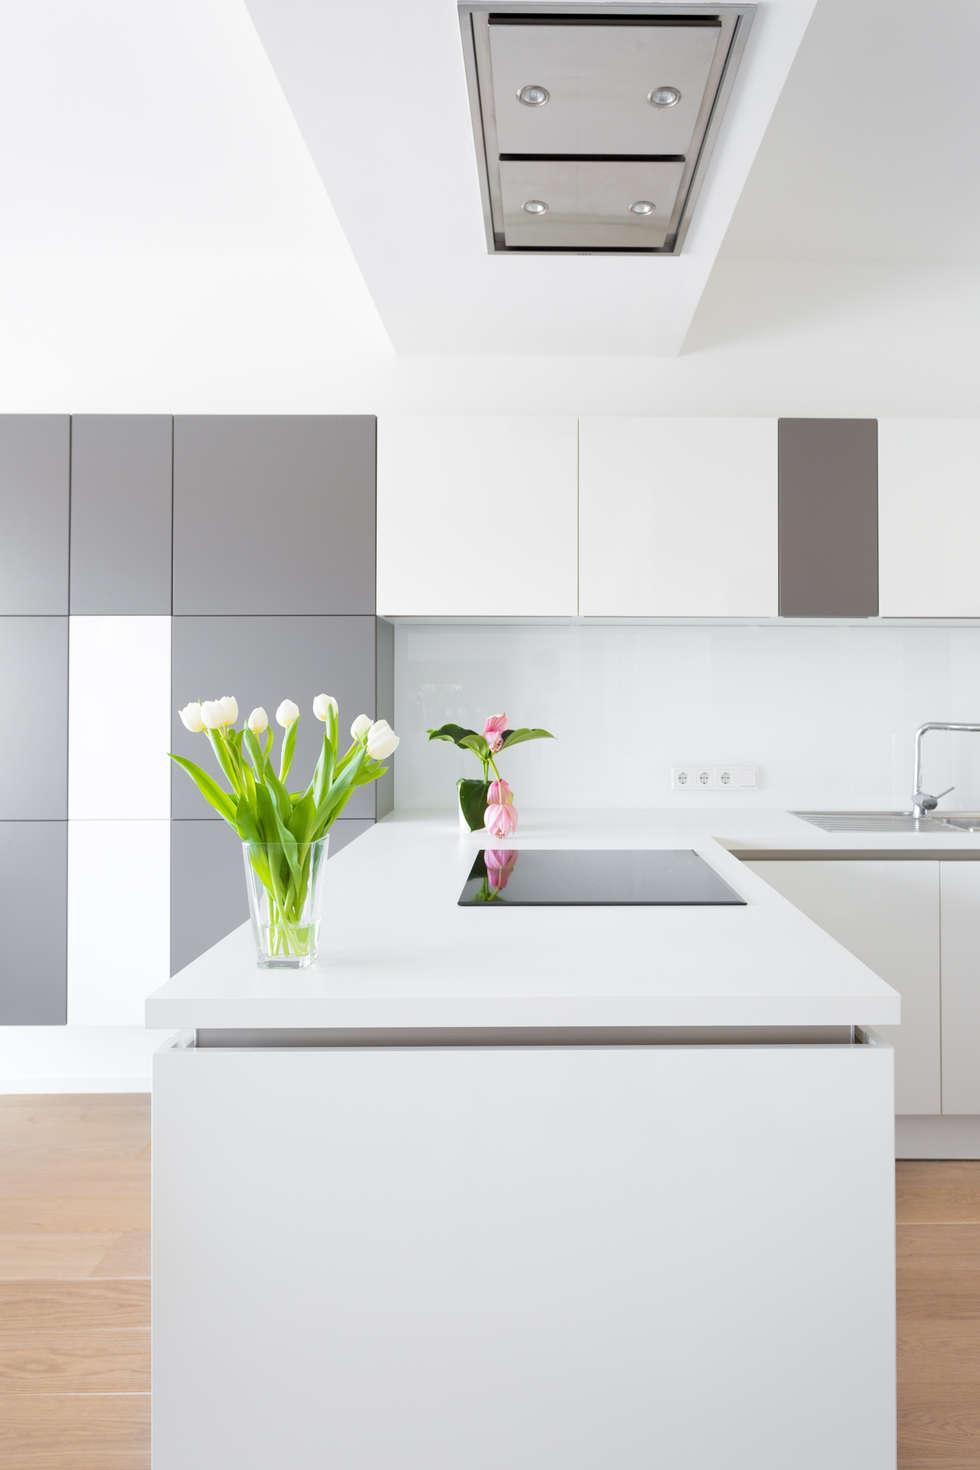 Meyer Raumausstattung wohnideen interior design einrichtungsideen bilder homify